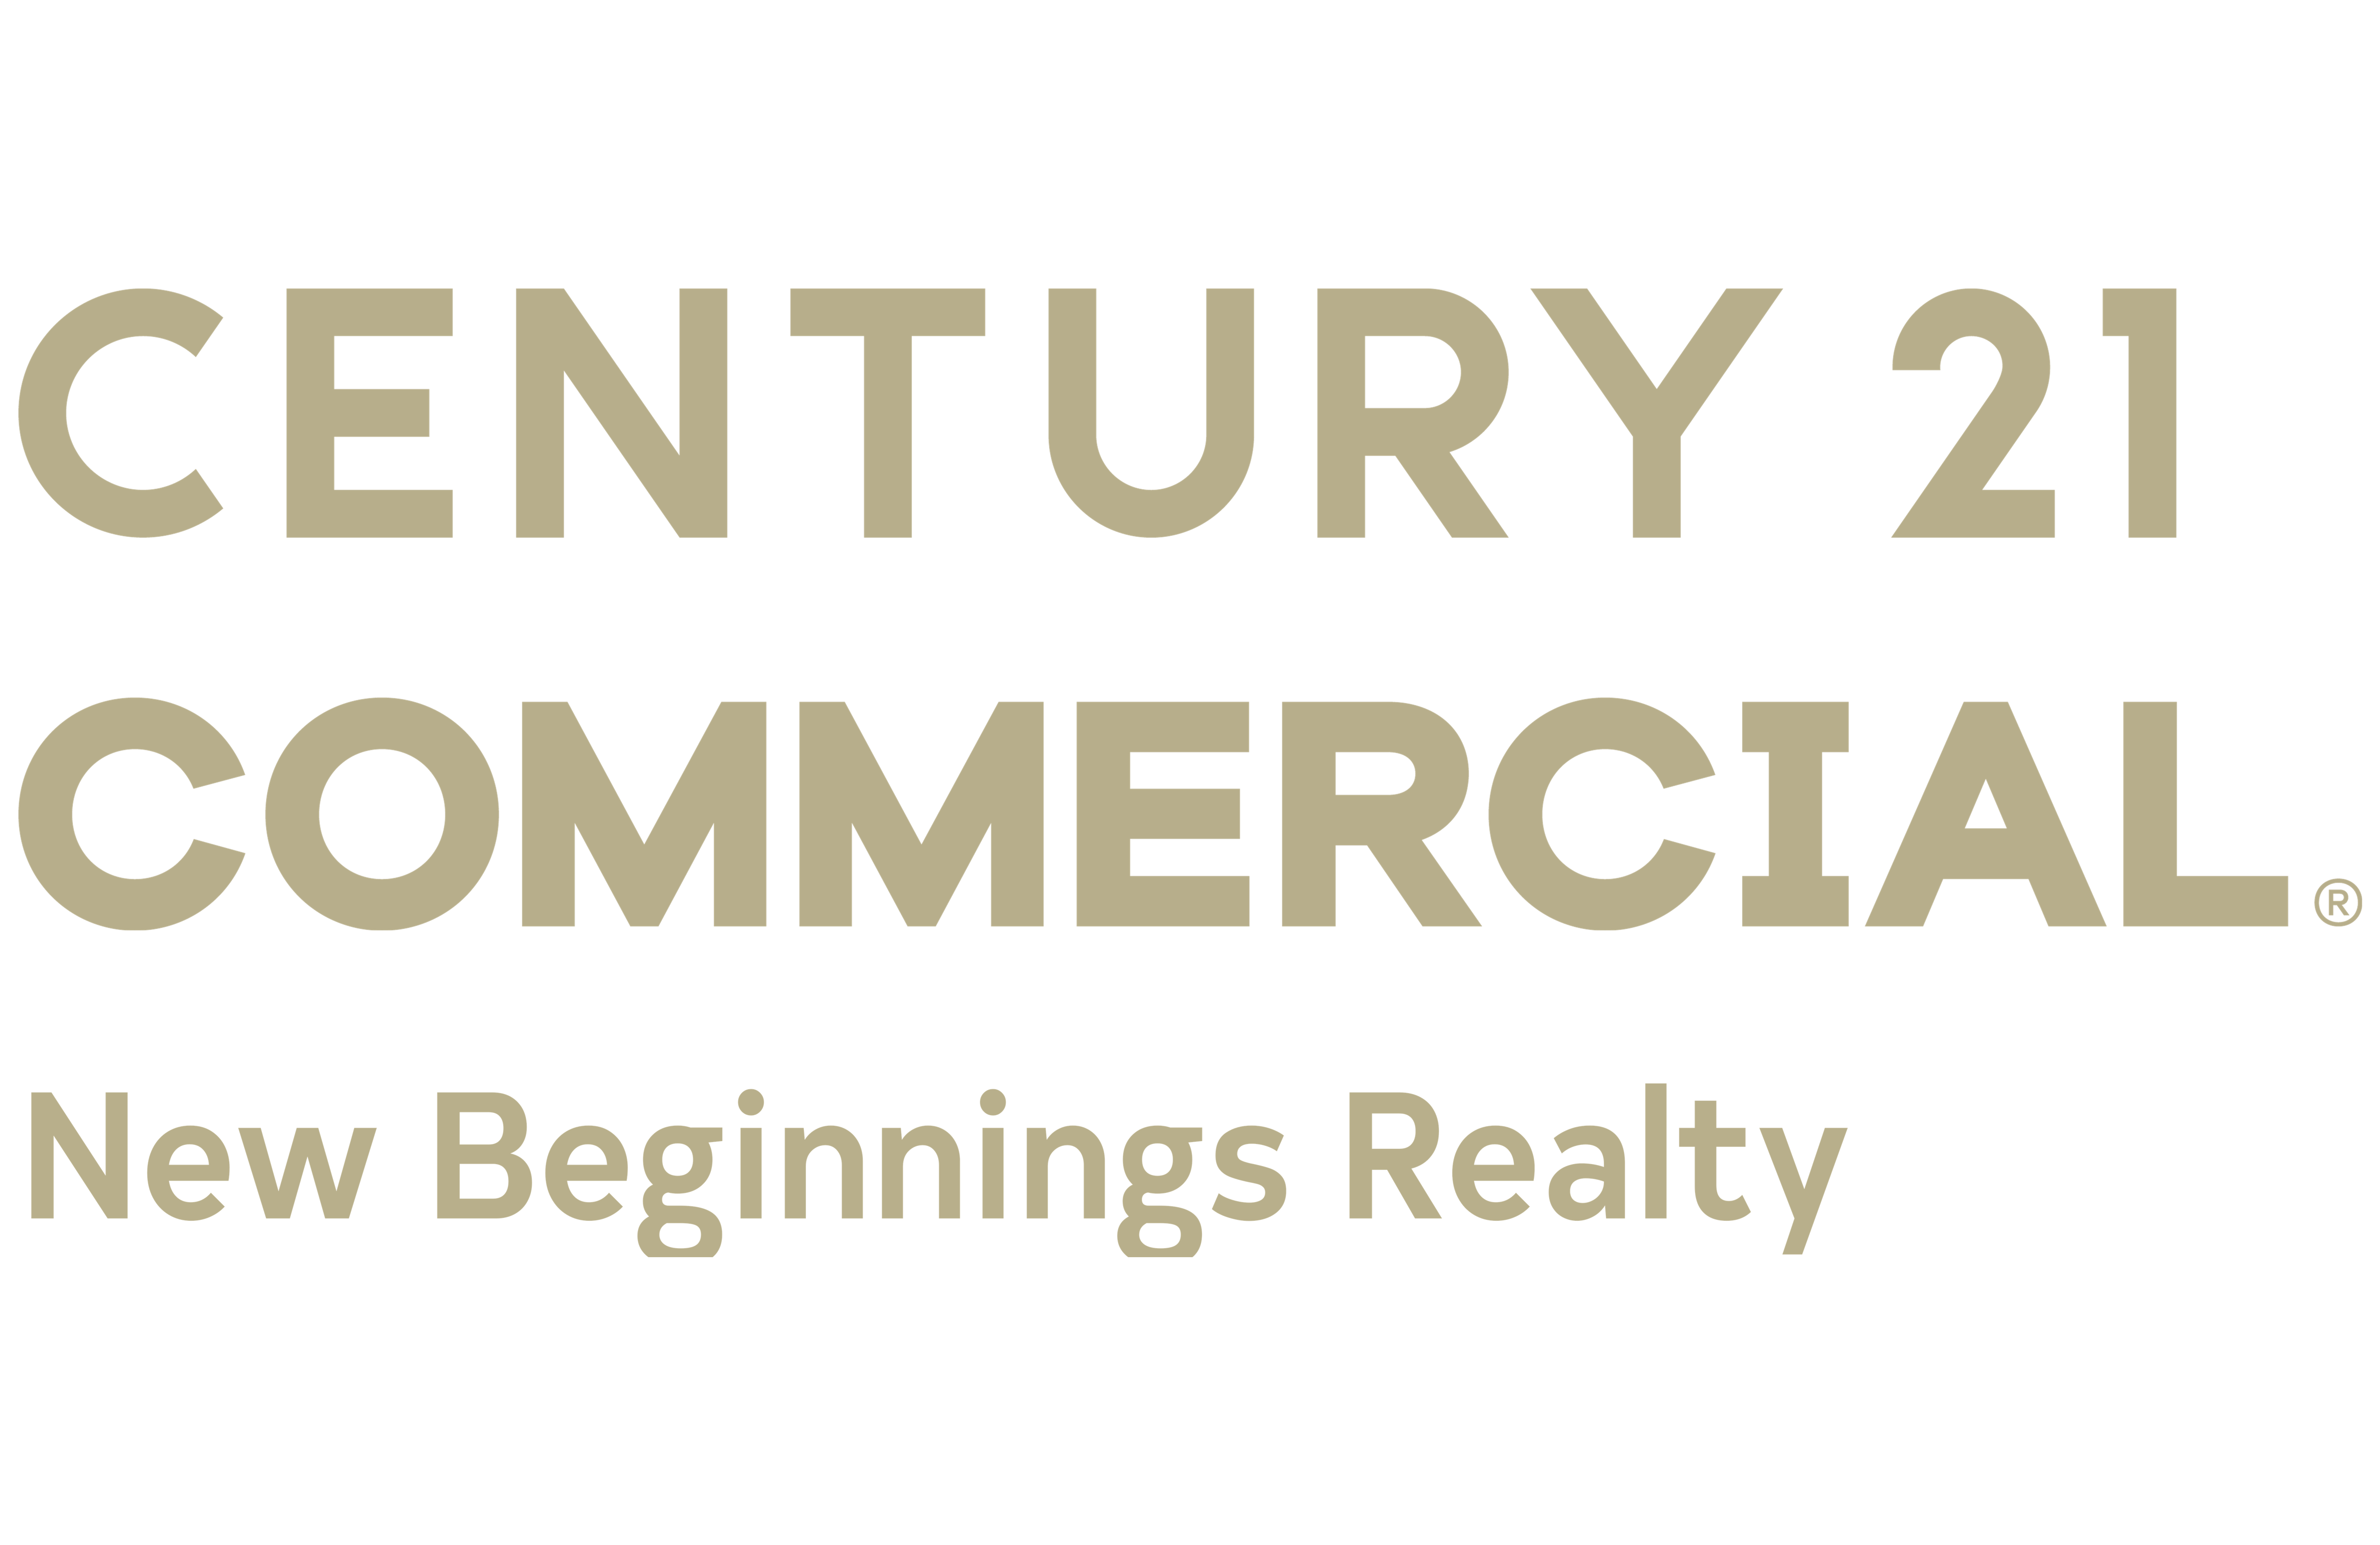 CENTURY 21 New Beginnings Realty